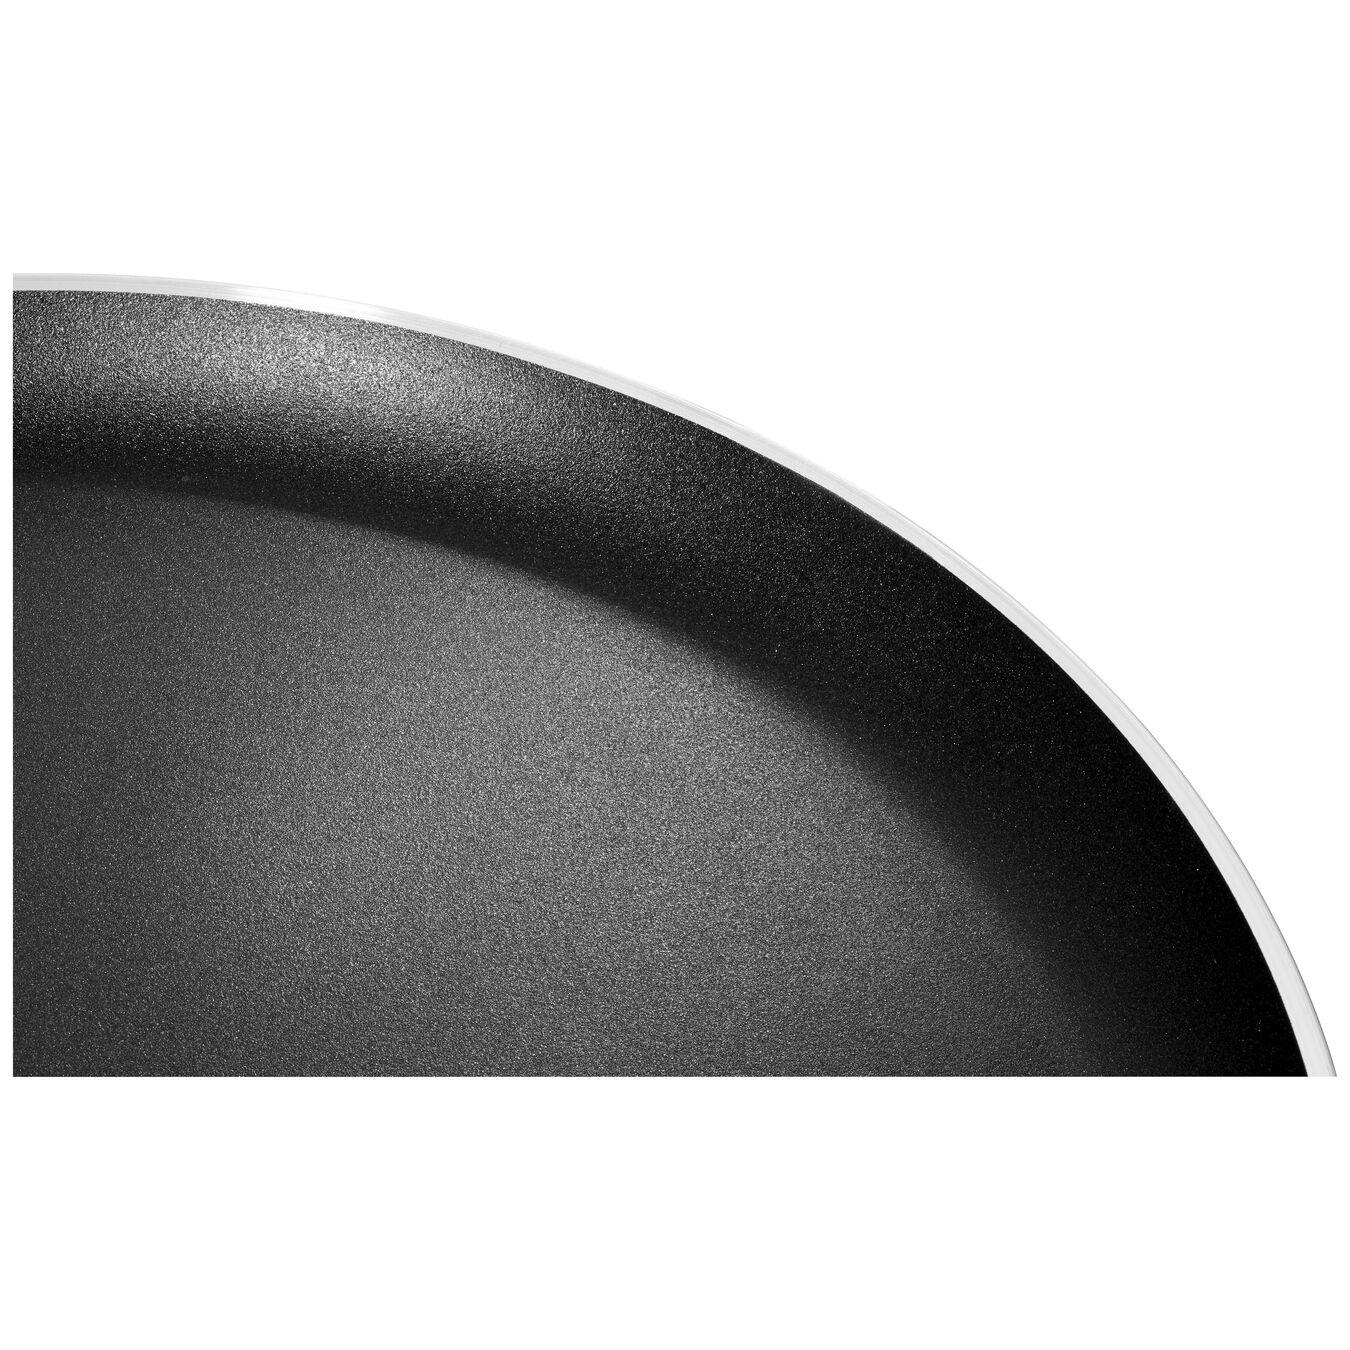 25 cm Aluminum Pancake pan,,large 6